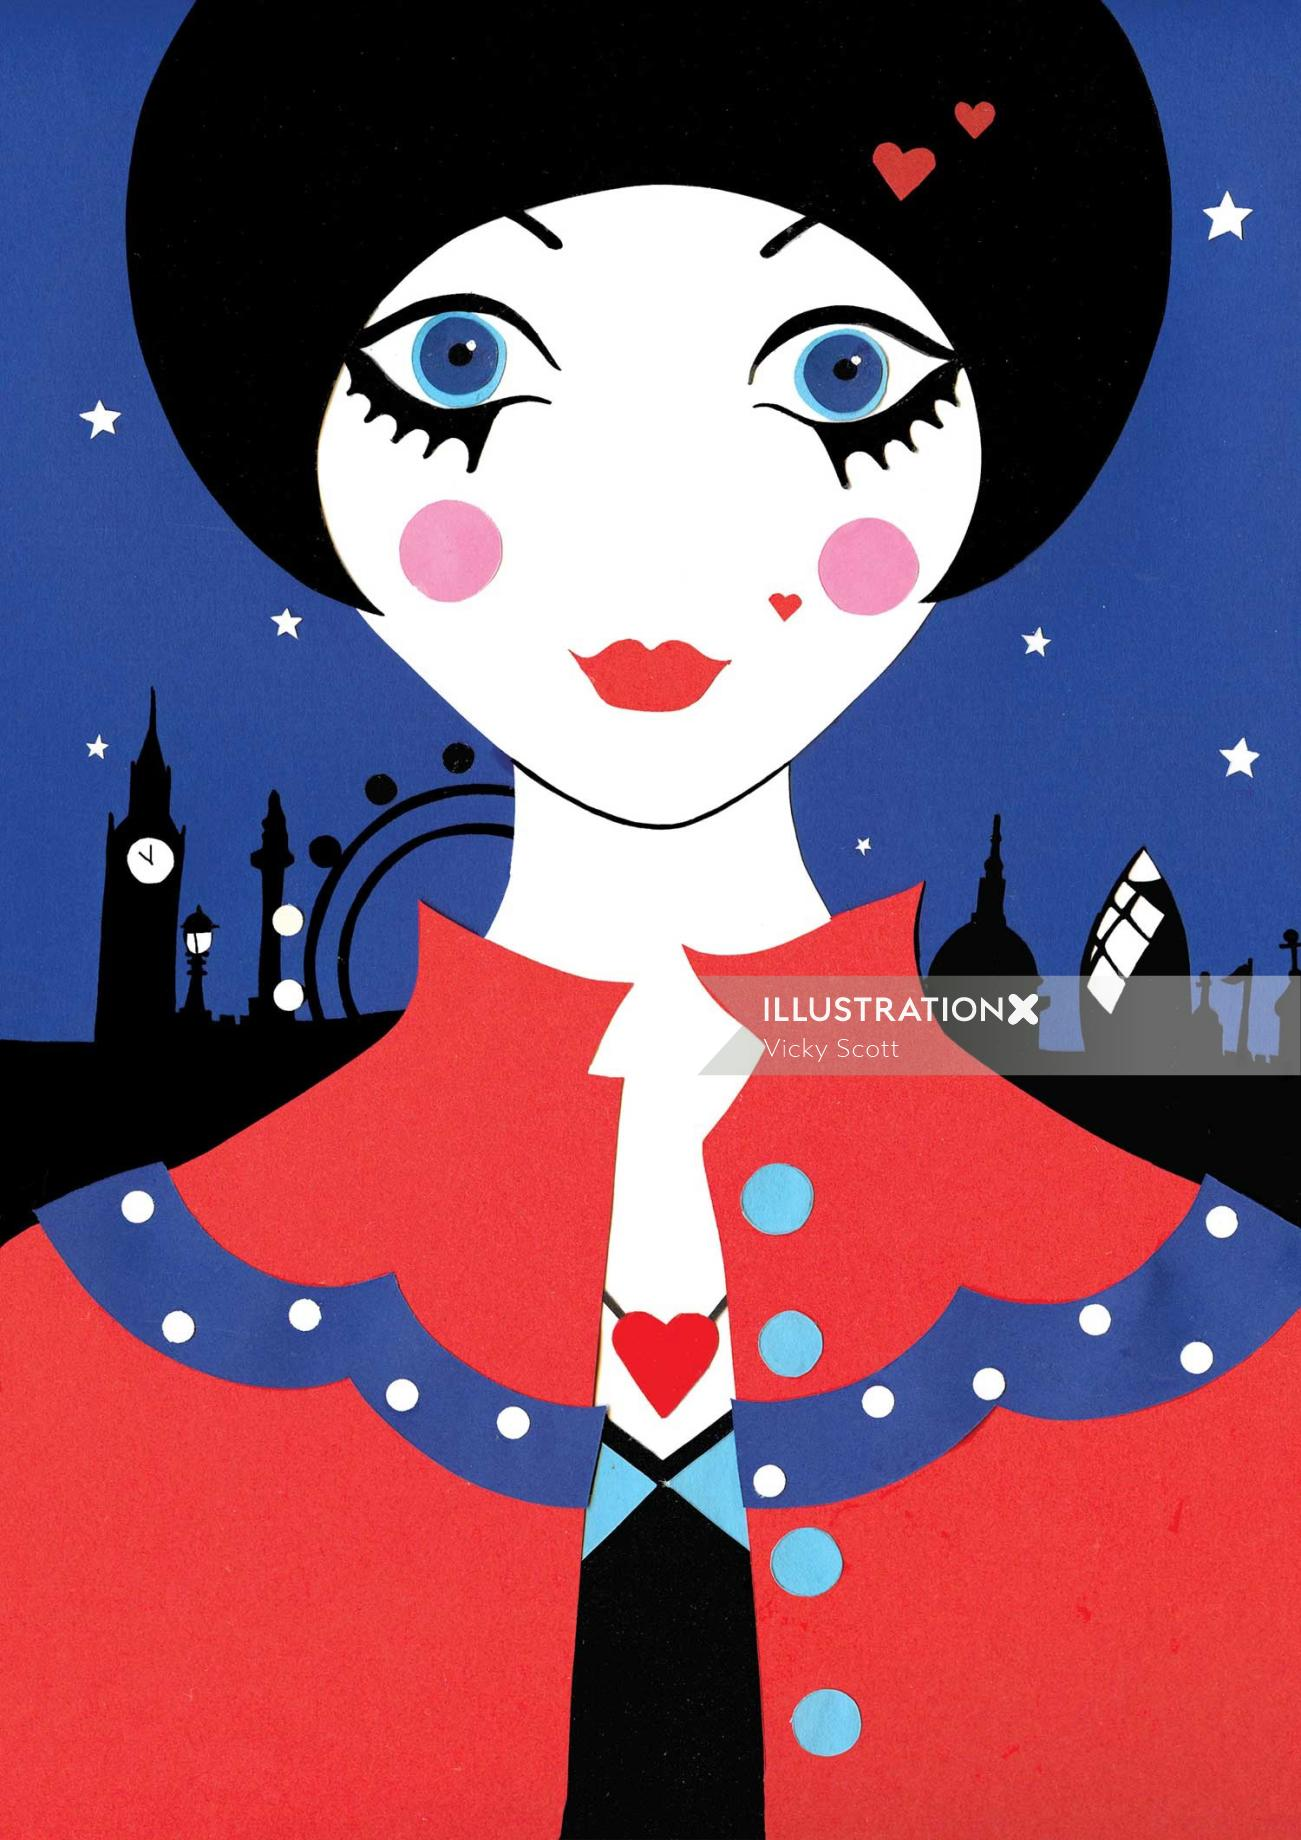 London, fashion, coat, heart, Big Ben, skylinw